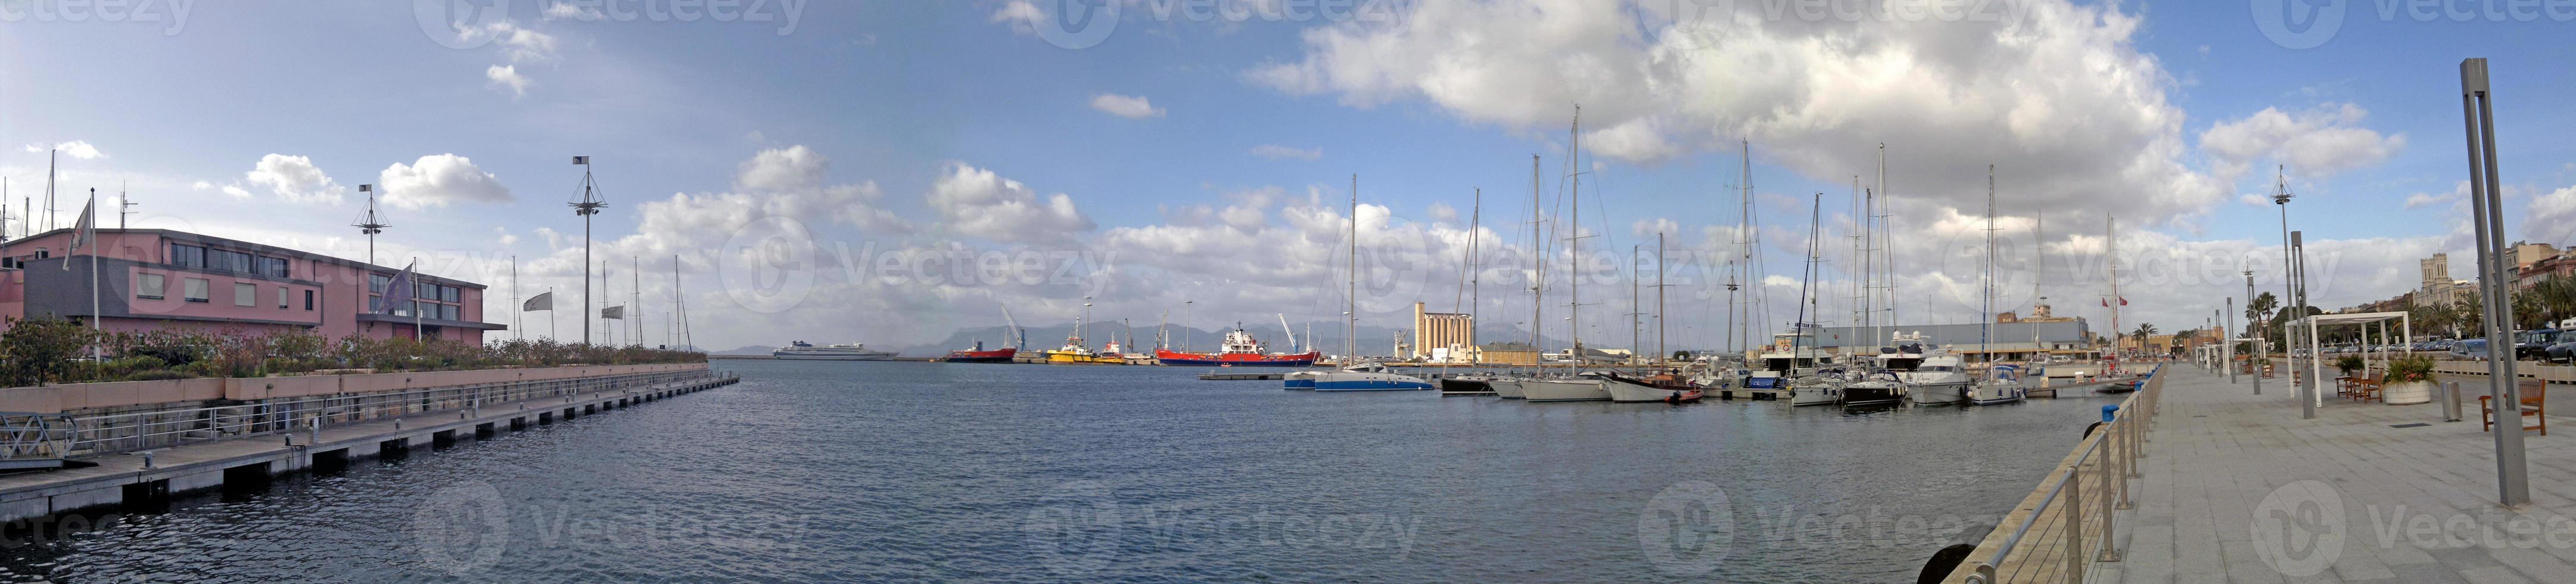 Harbor superwide photo